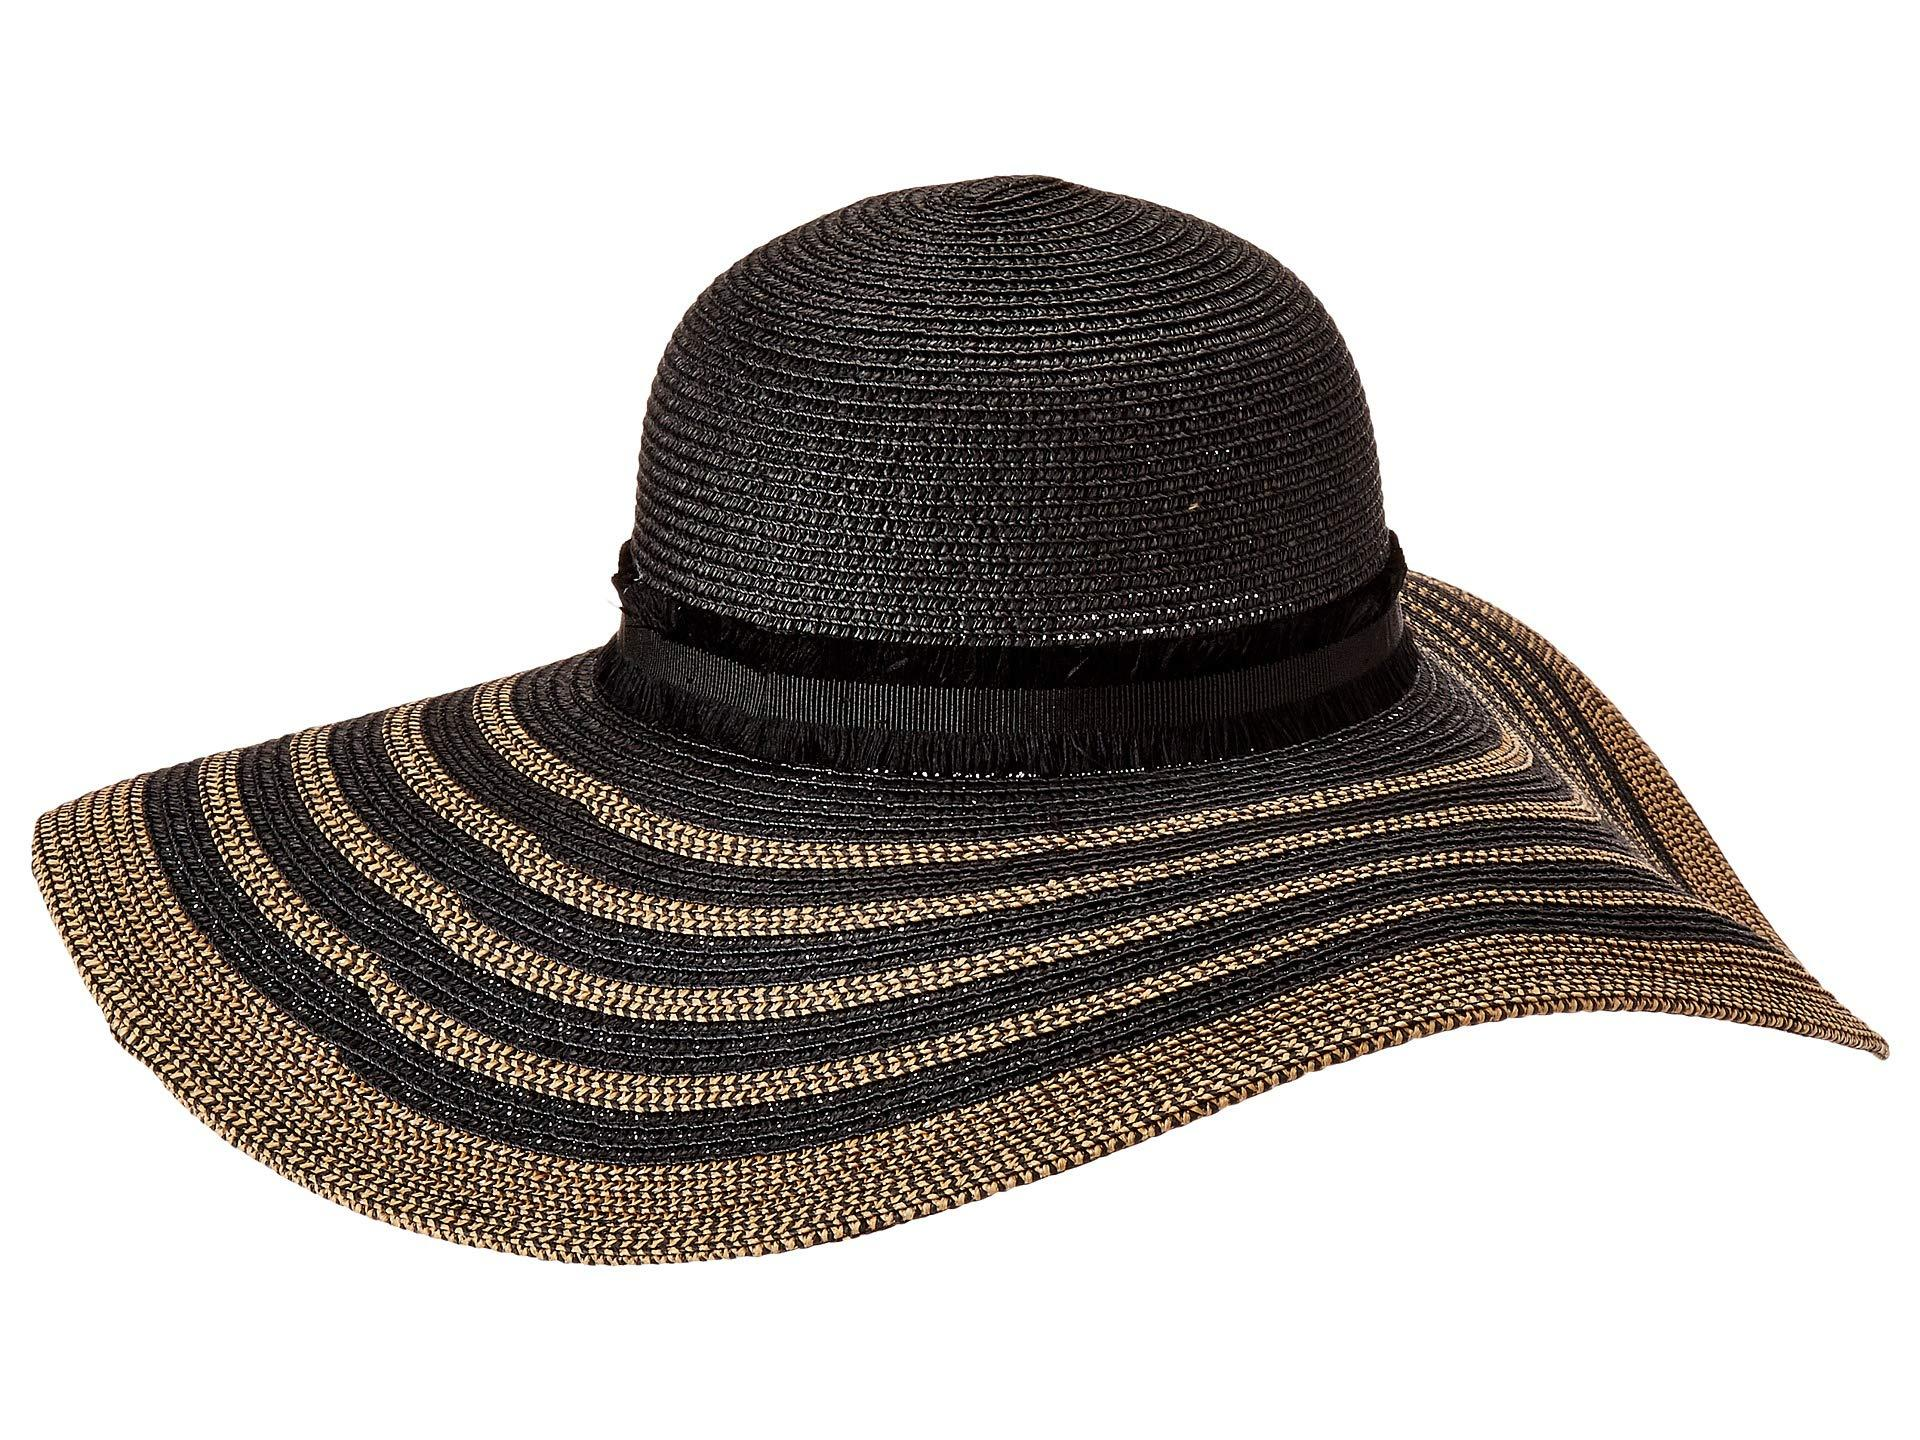 3f0397446 Lyst - Steve Madden Maled Braid Wide Brim Floppy Hat (black/tan ...